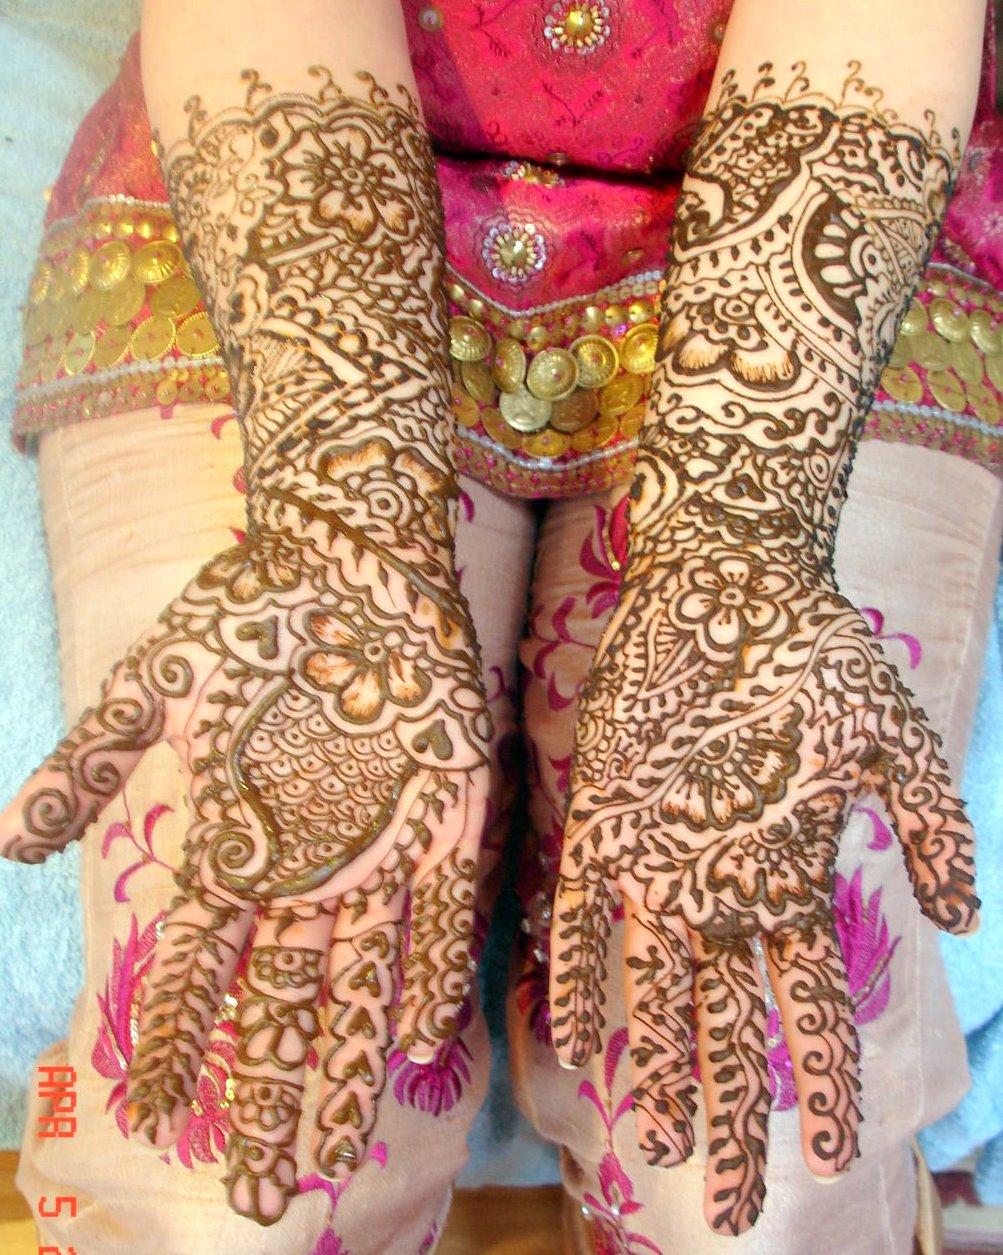 All World Fashion New And Cricket Updates Bridal Mehndi Henna Design